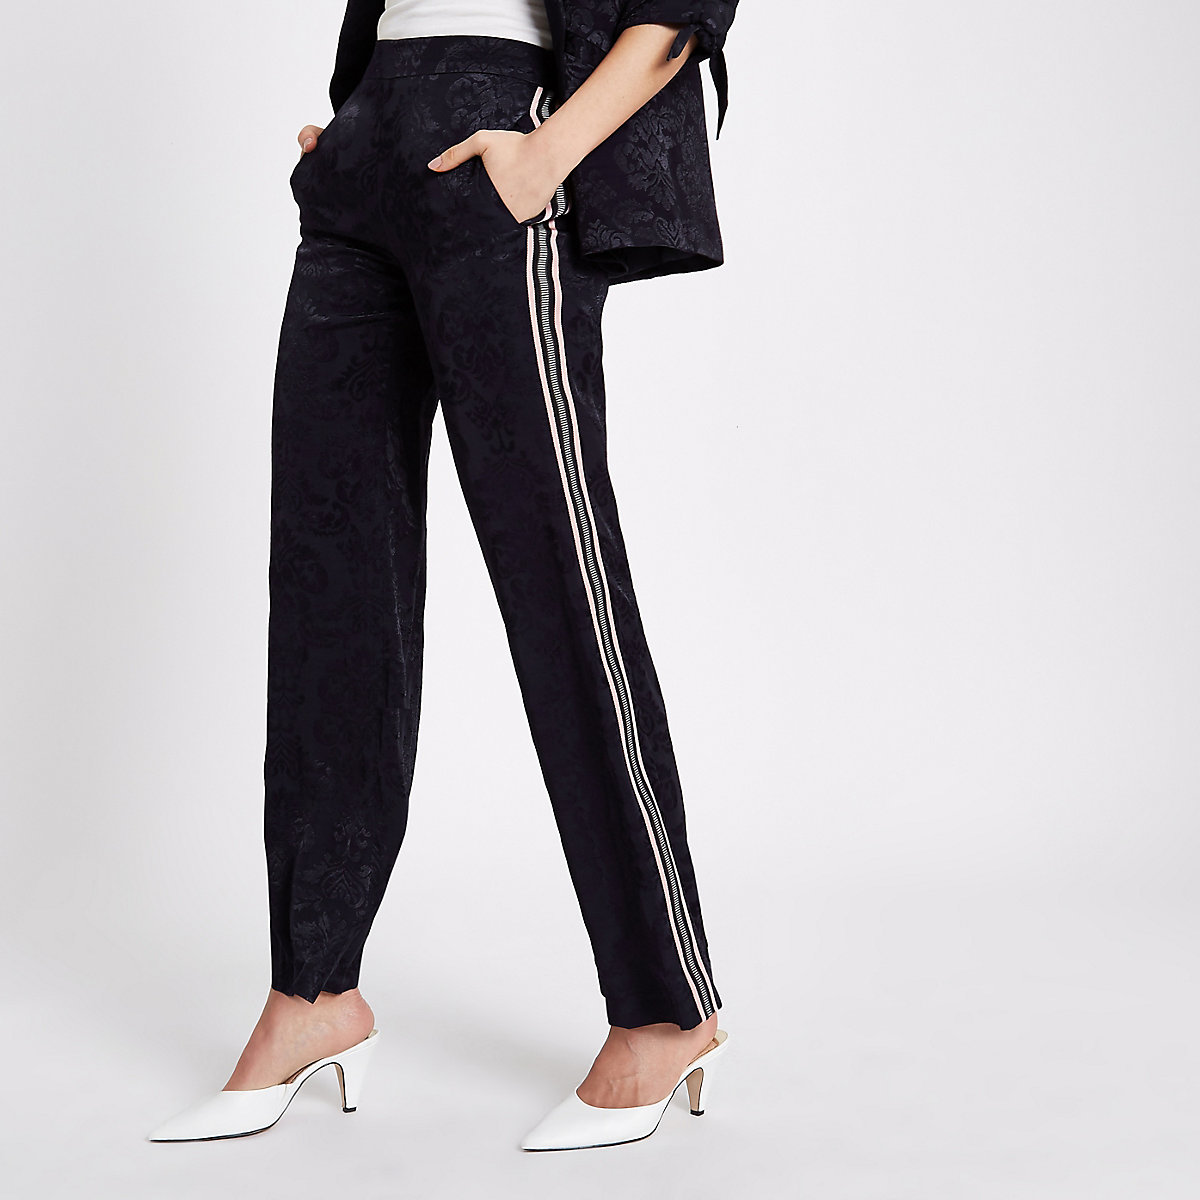 Navy jacquard stripe side pants